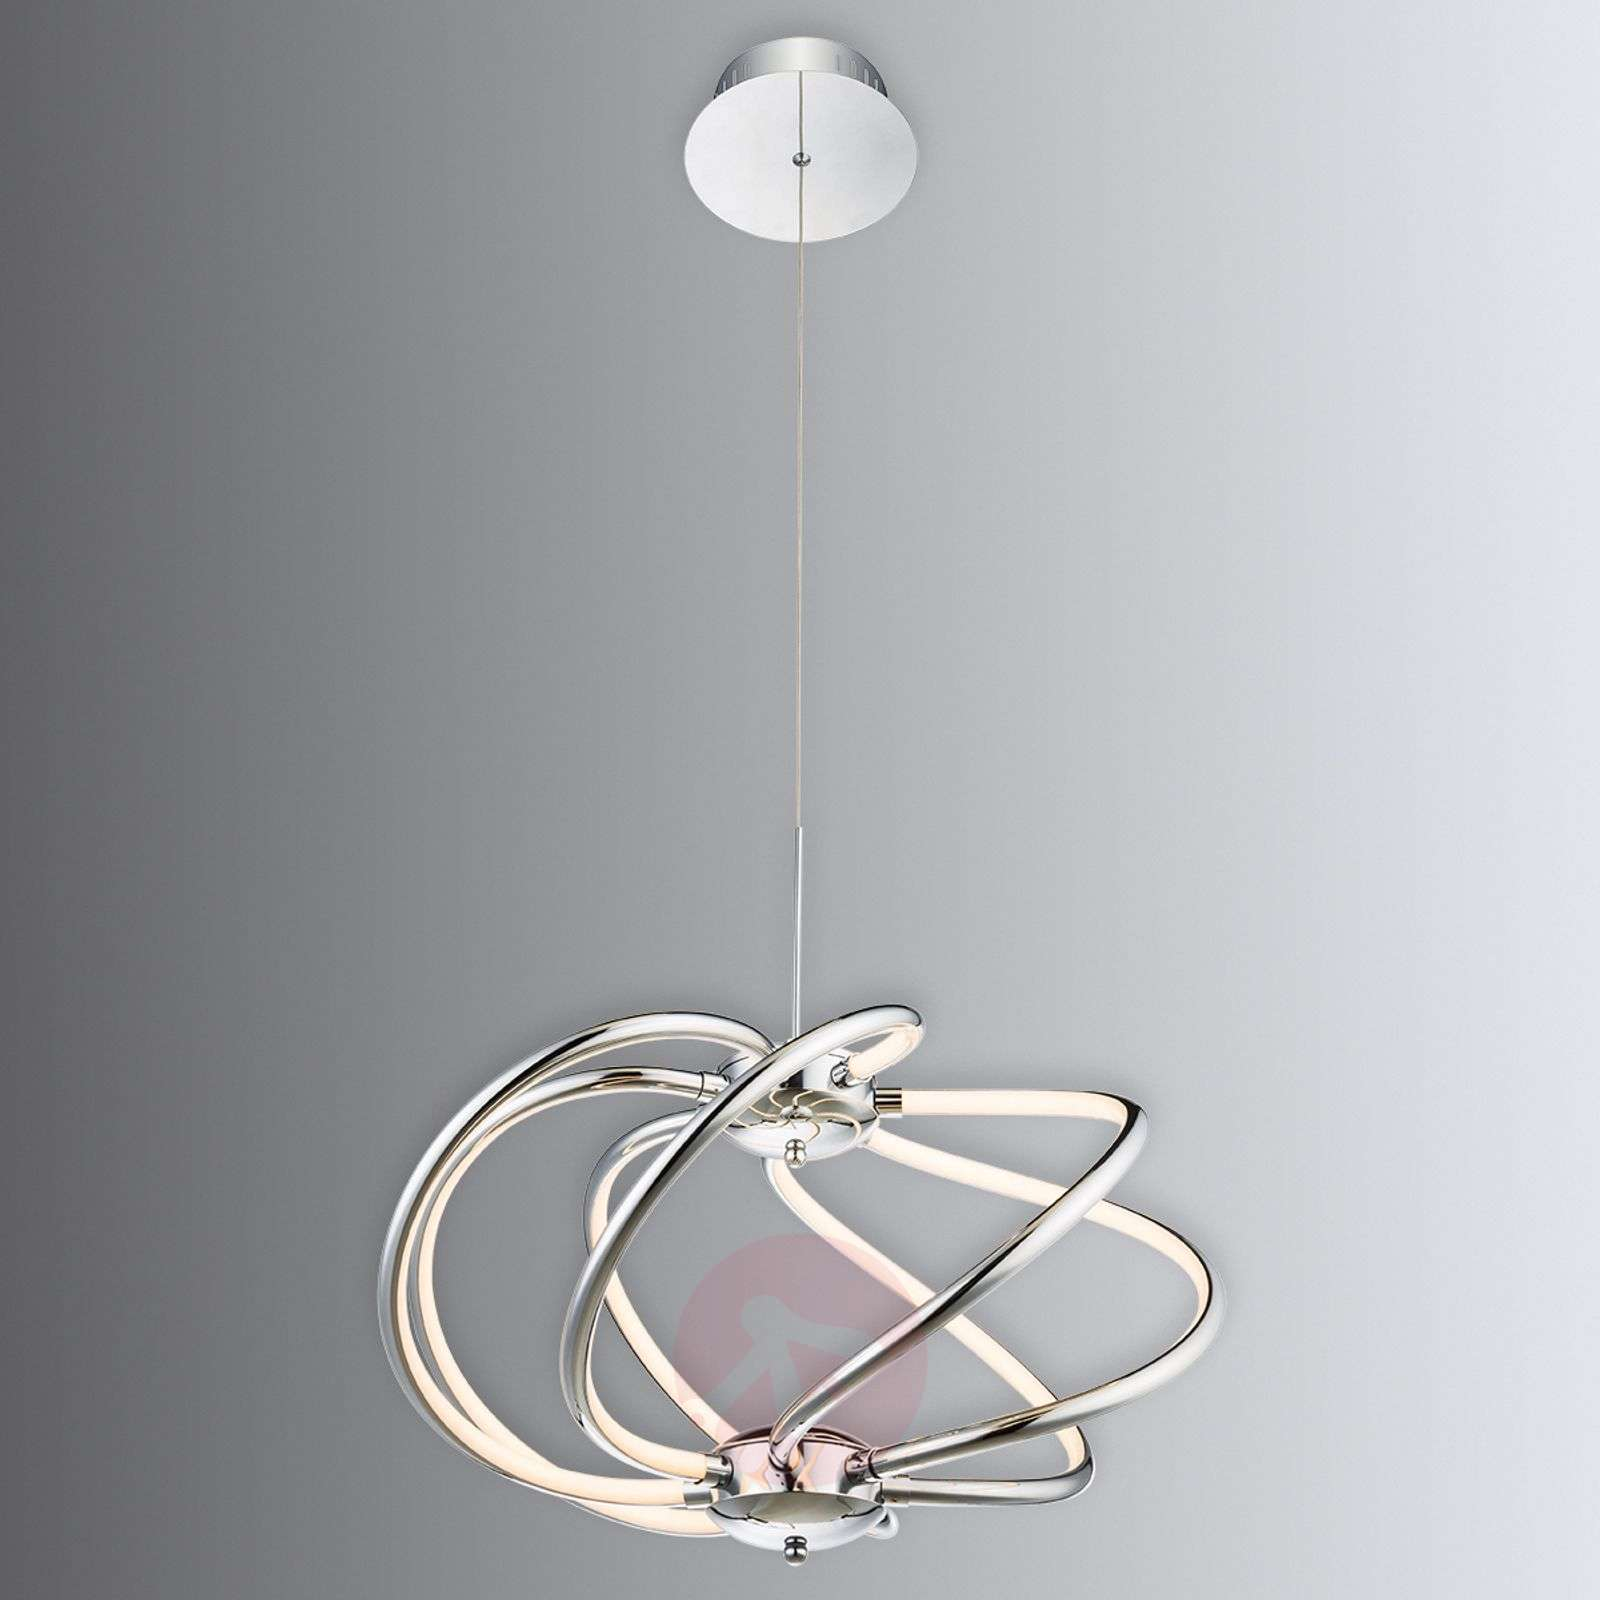 Tehokkaasti suunniteltu LED-riippuvalaisin Samia-4014755-01